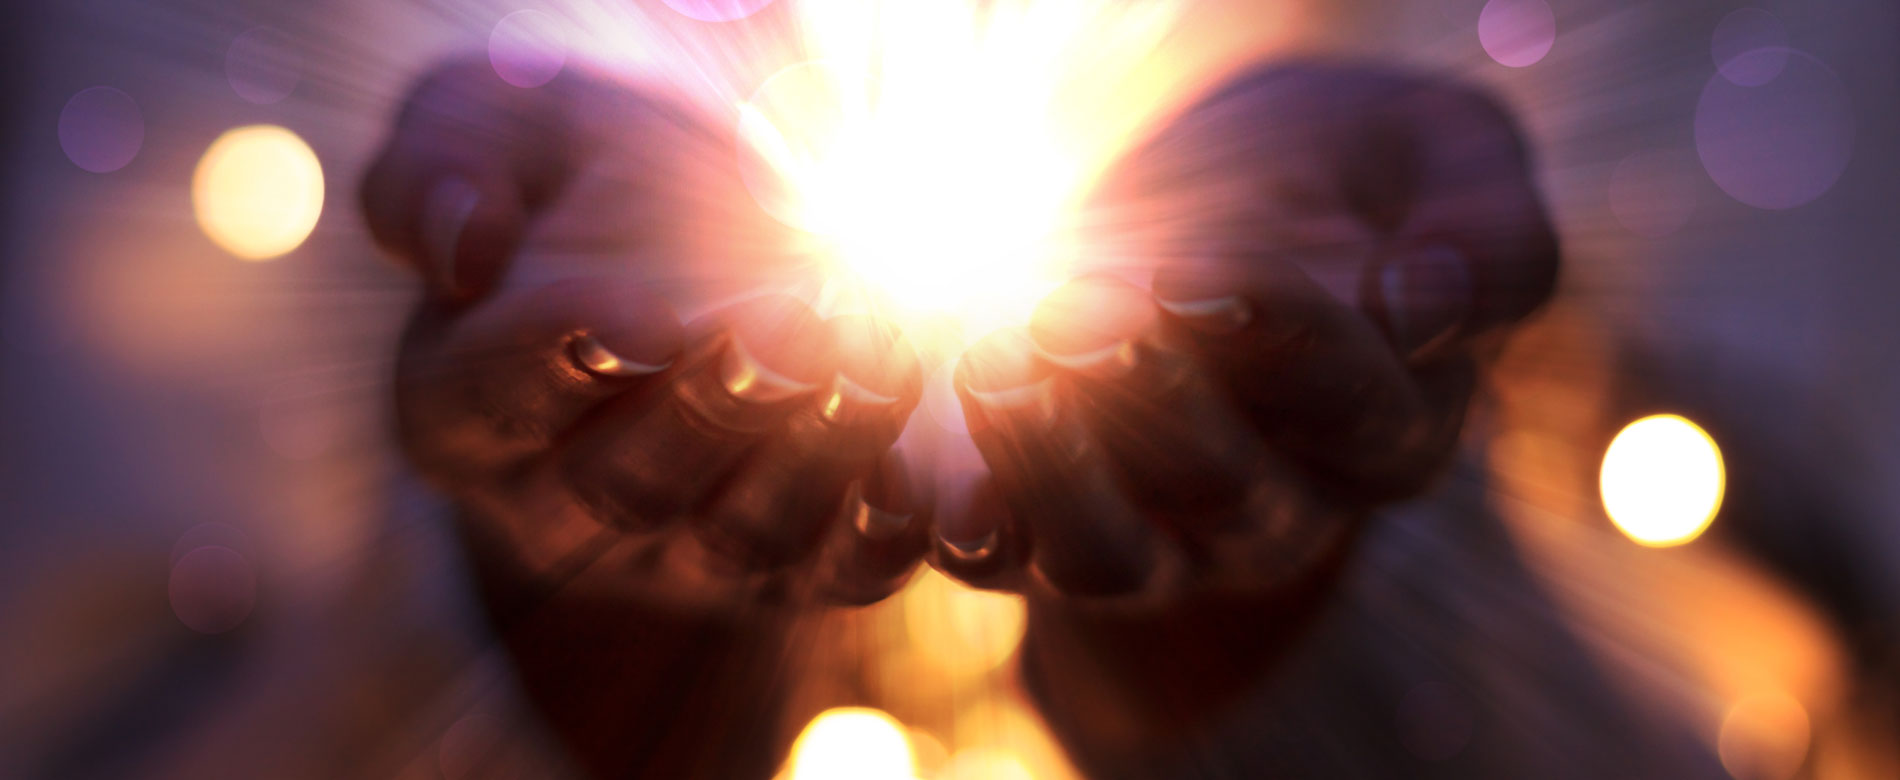 87 – Qual é a armadilha do diabo?